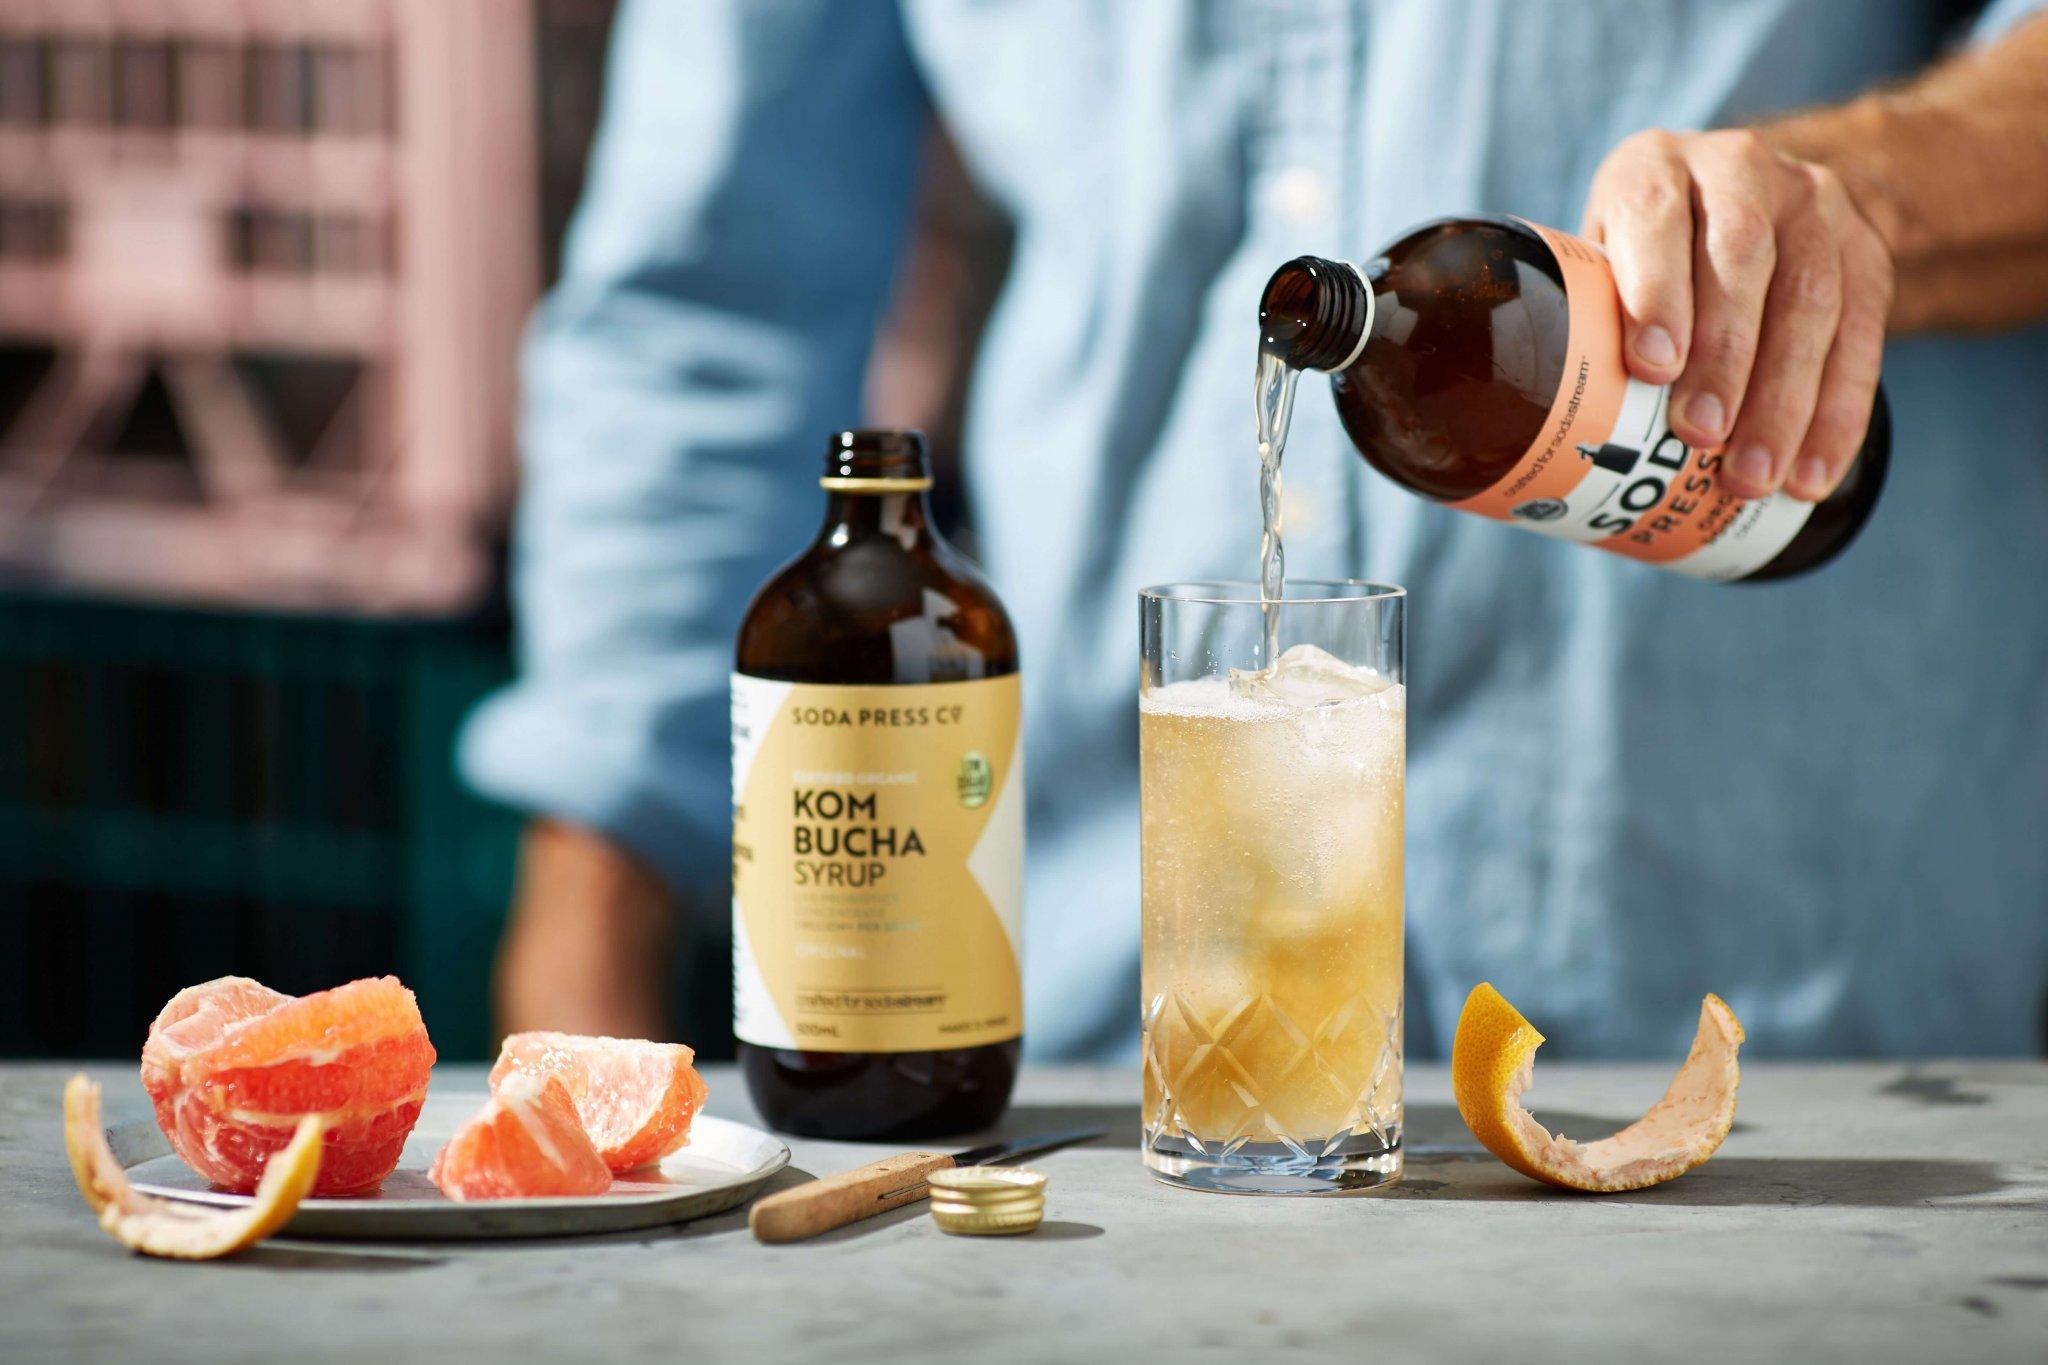 west-end-magazine-soda-press-kombucha-syrup